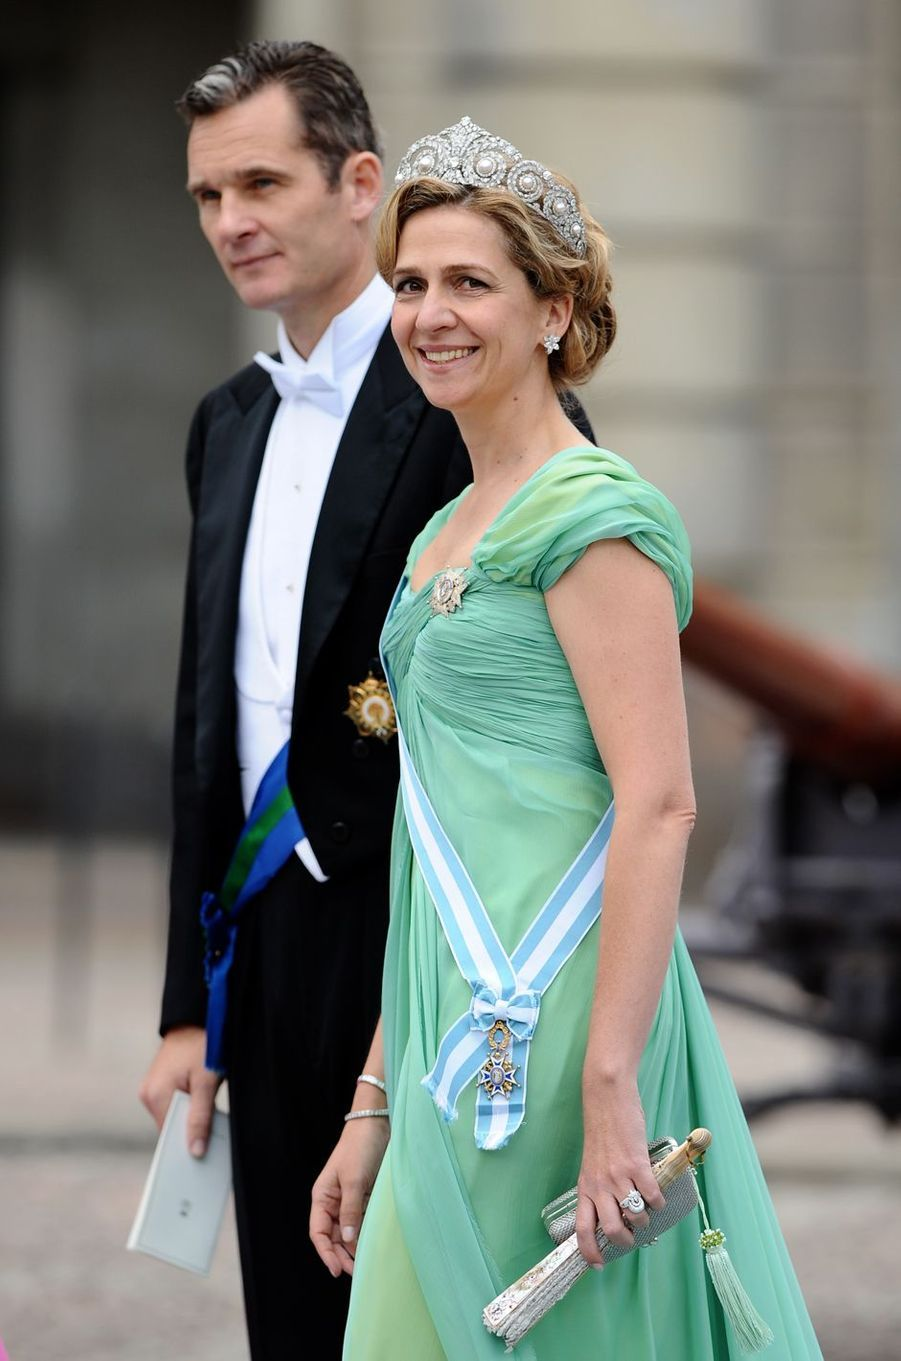 Inaki Urdangarin et la princesse Cristina d'Espagne, le 19 juin 2010